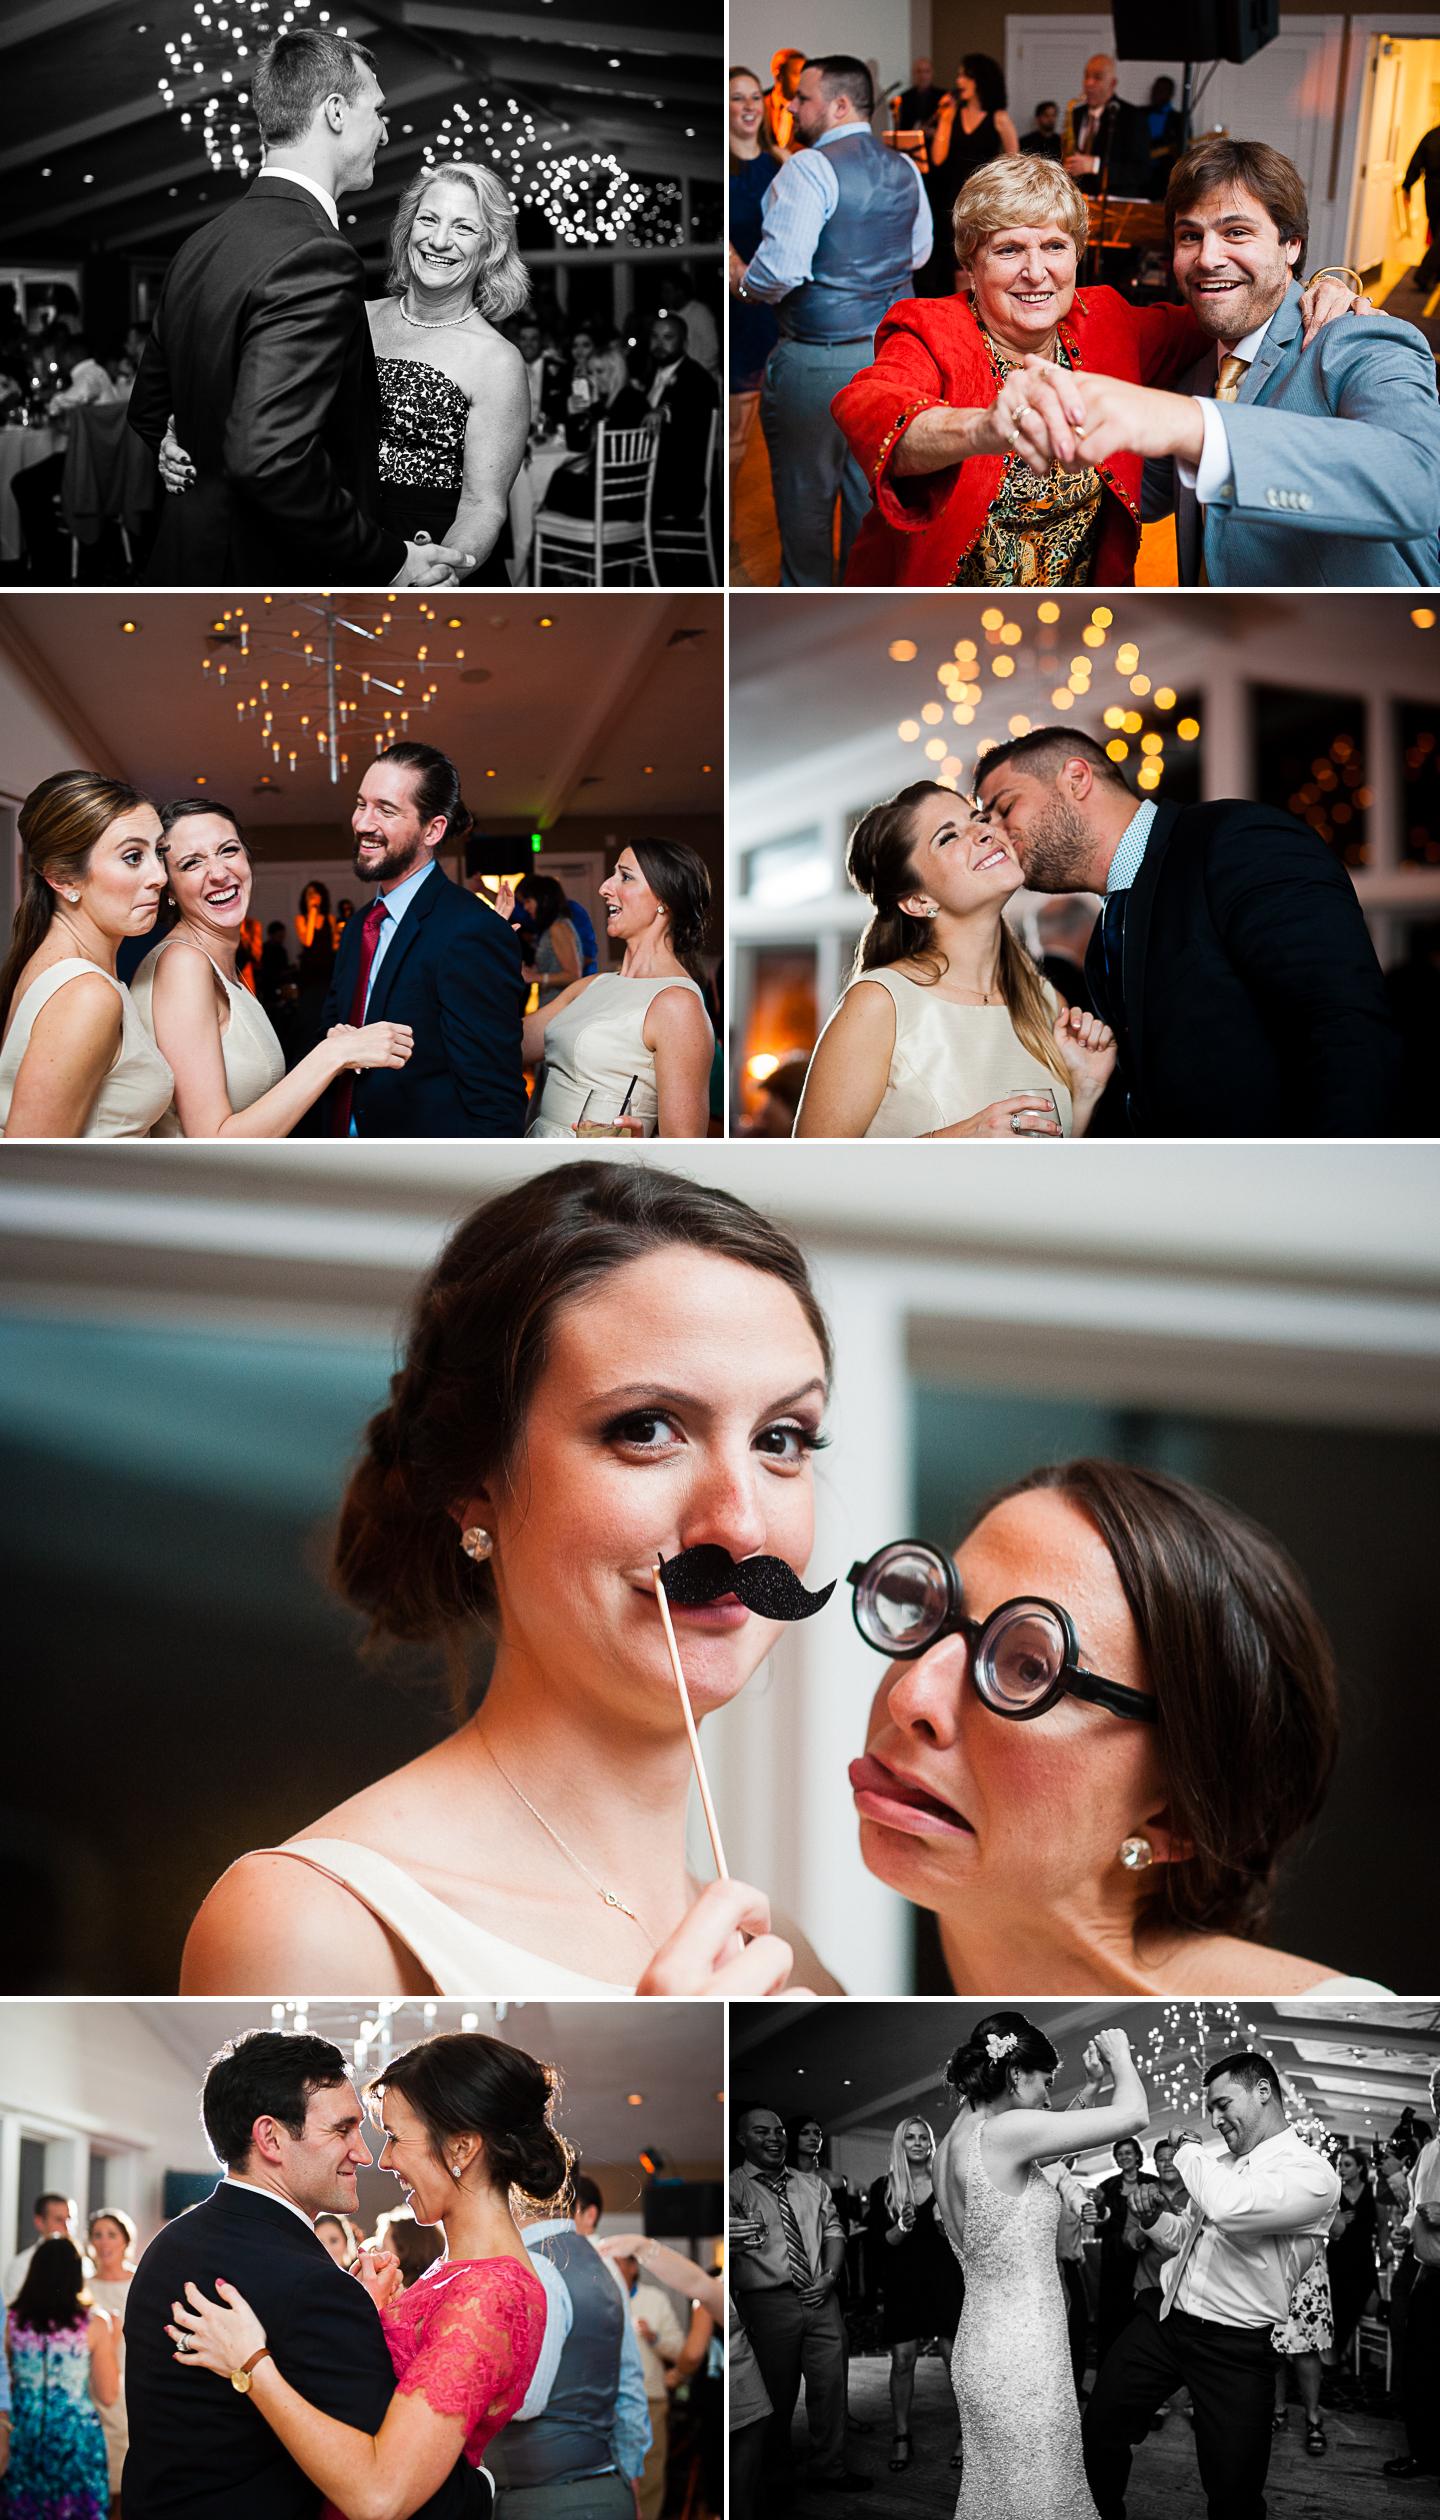 collage of wedding guests having a blast on the dance floor of  seaside wedding